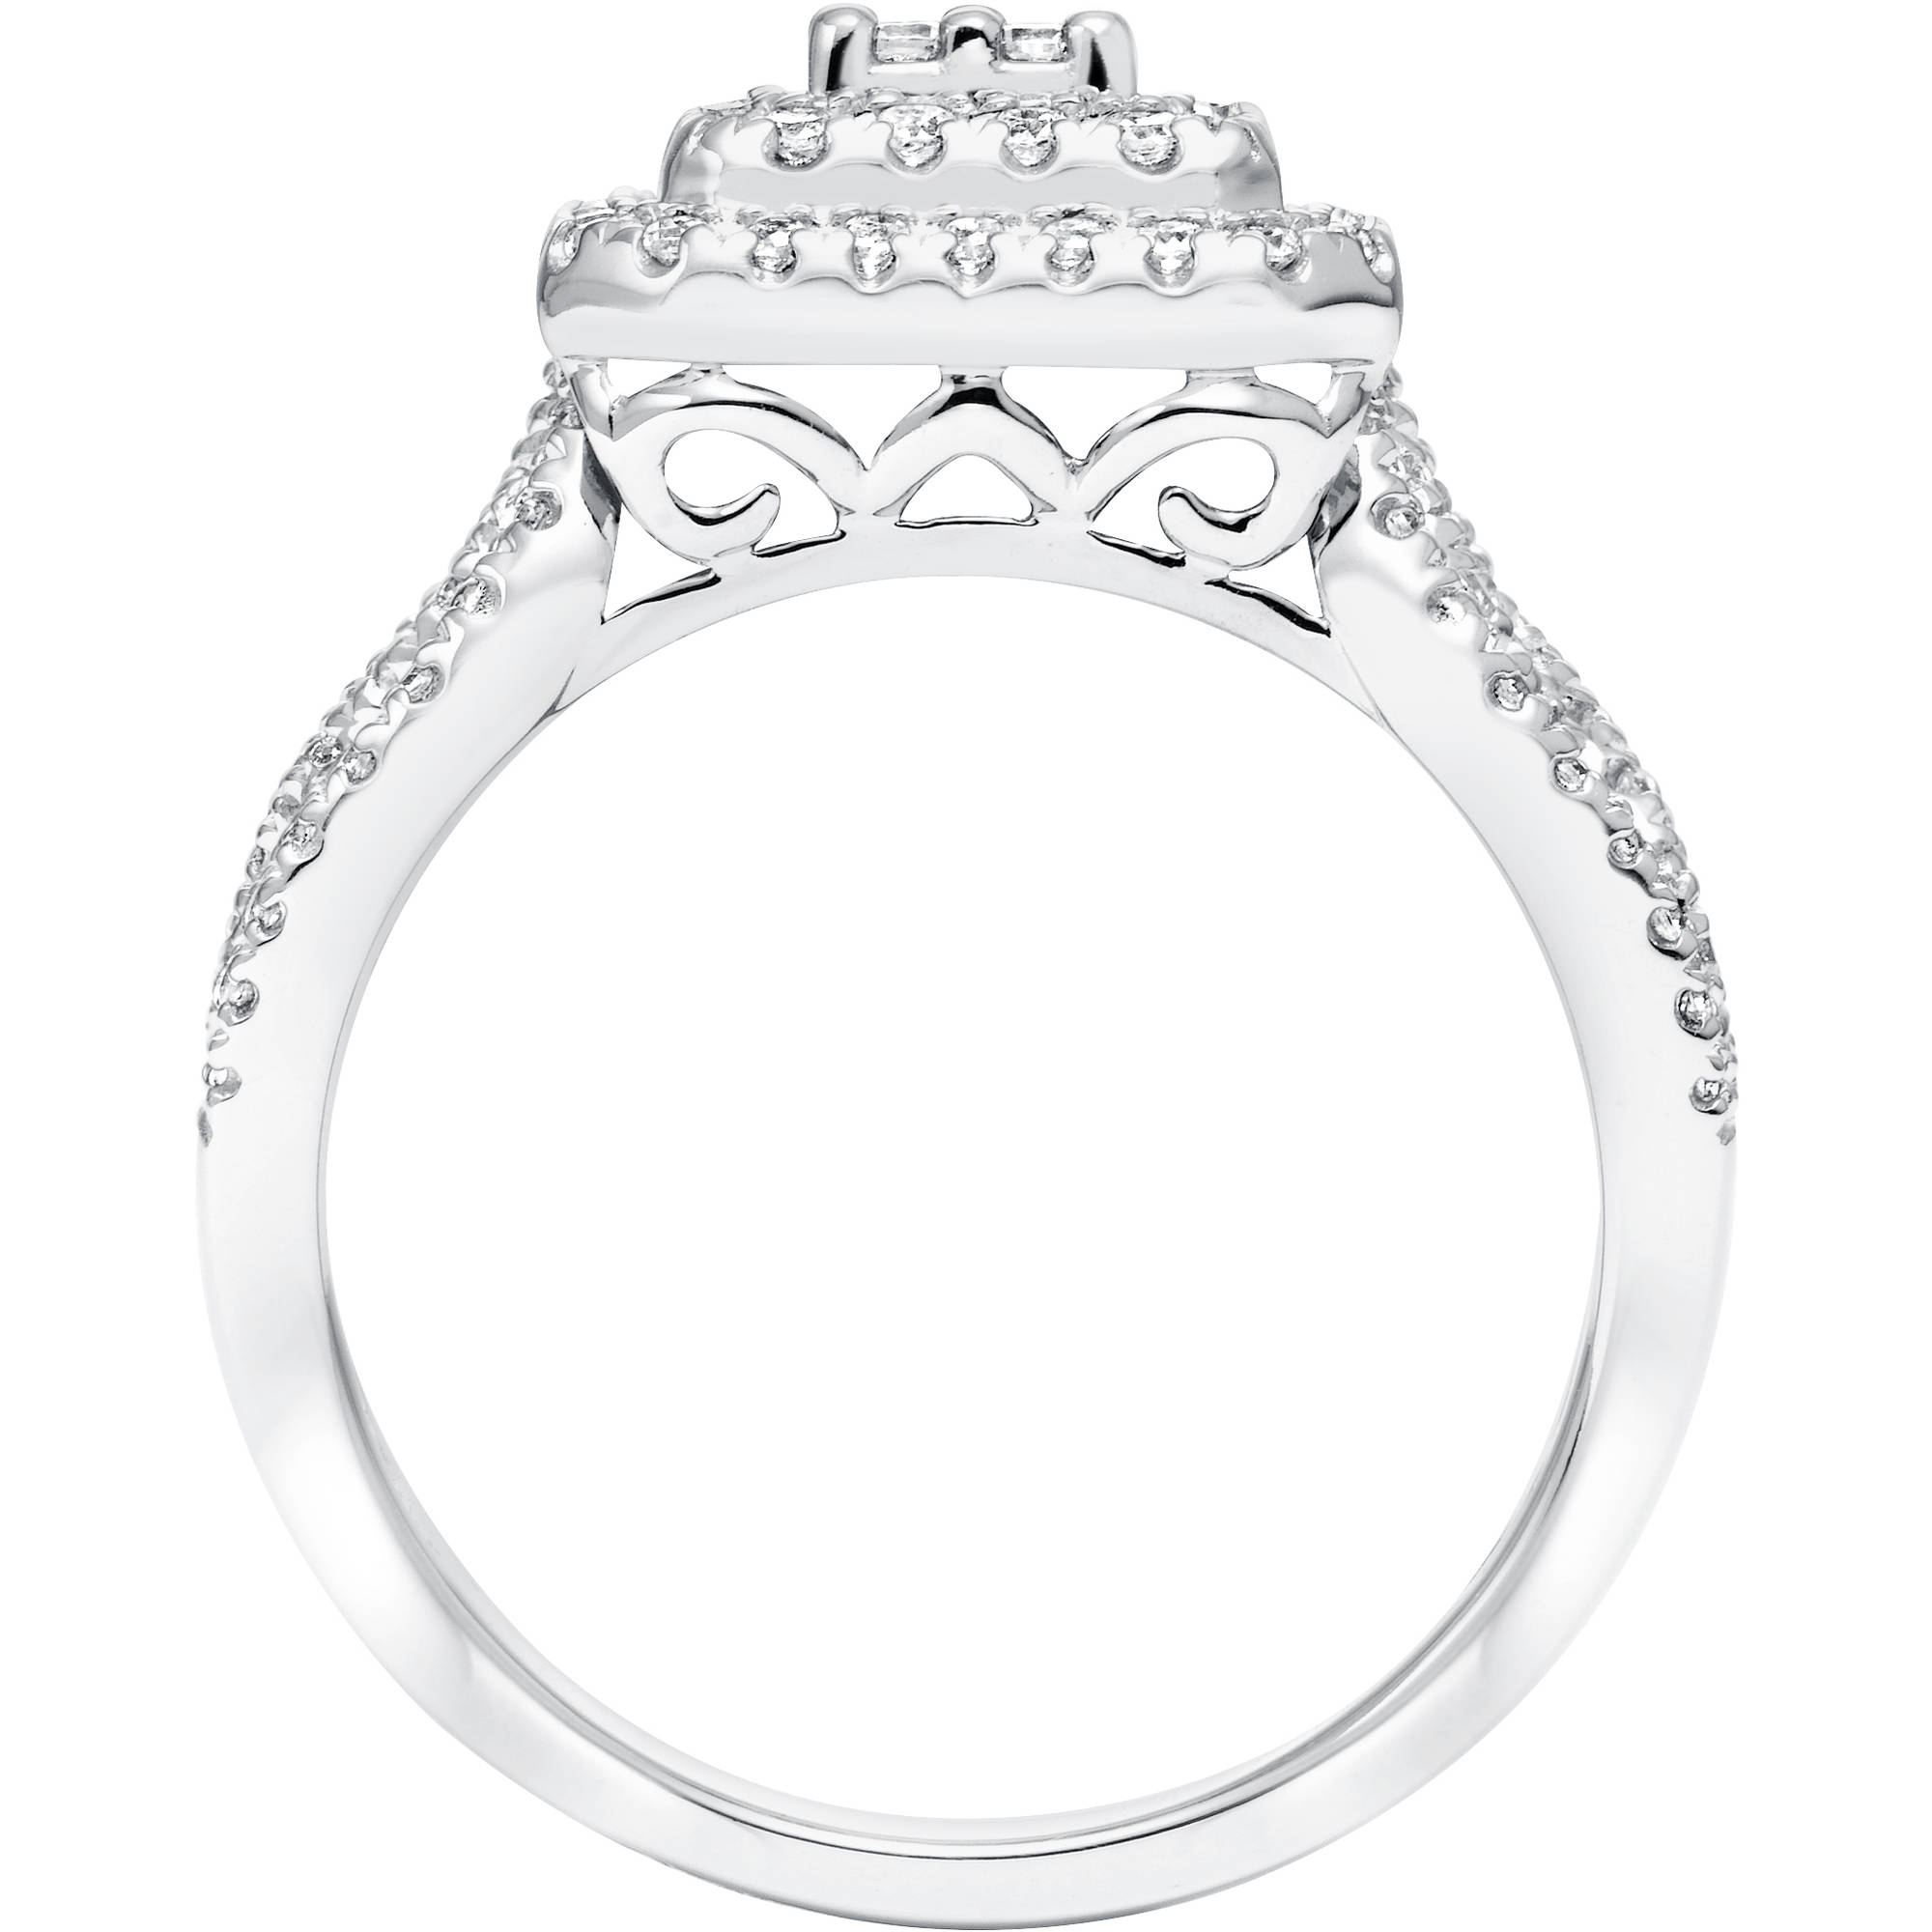 2 Carat Tw Diamond Sterling Silver Ring   Walmart